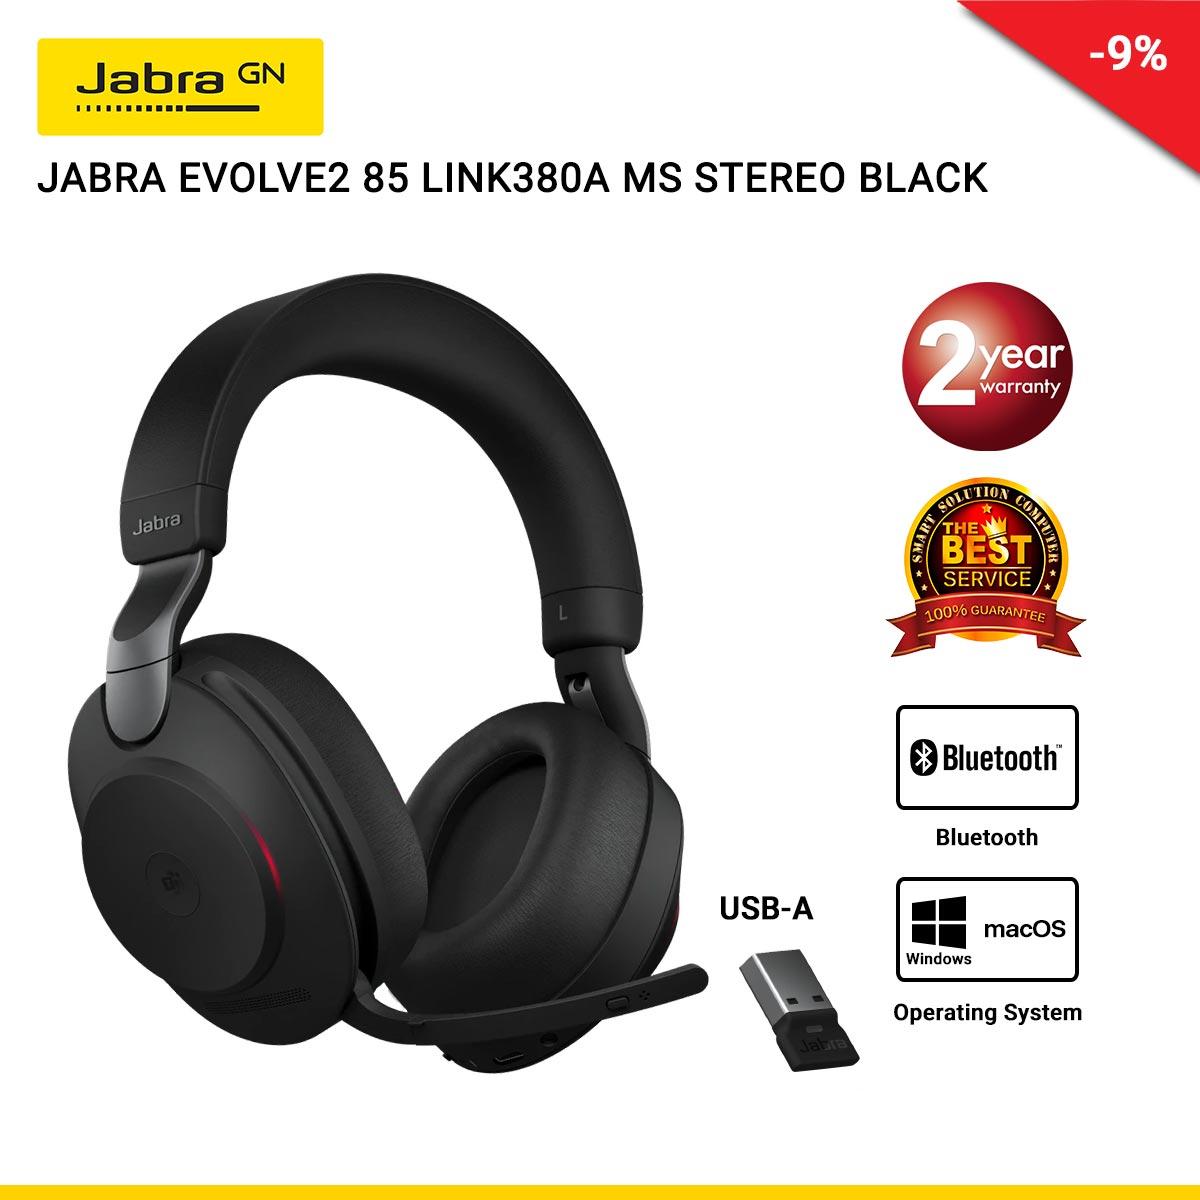 JABRA EVOLVE2 85 LINK380A MS STEREO BLACK (JBA-28599-999-999)